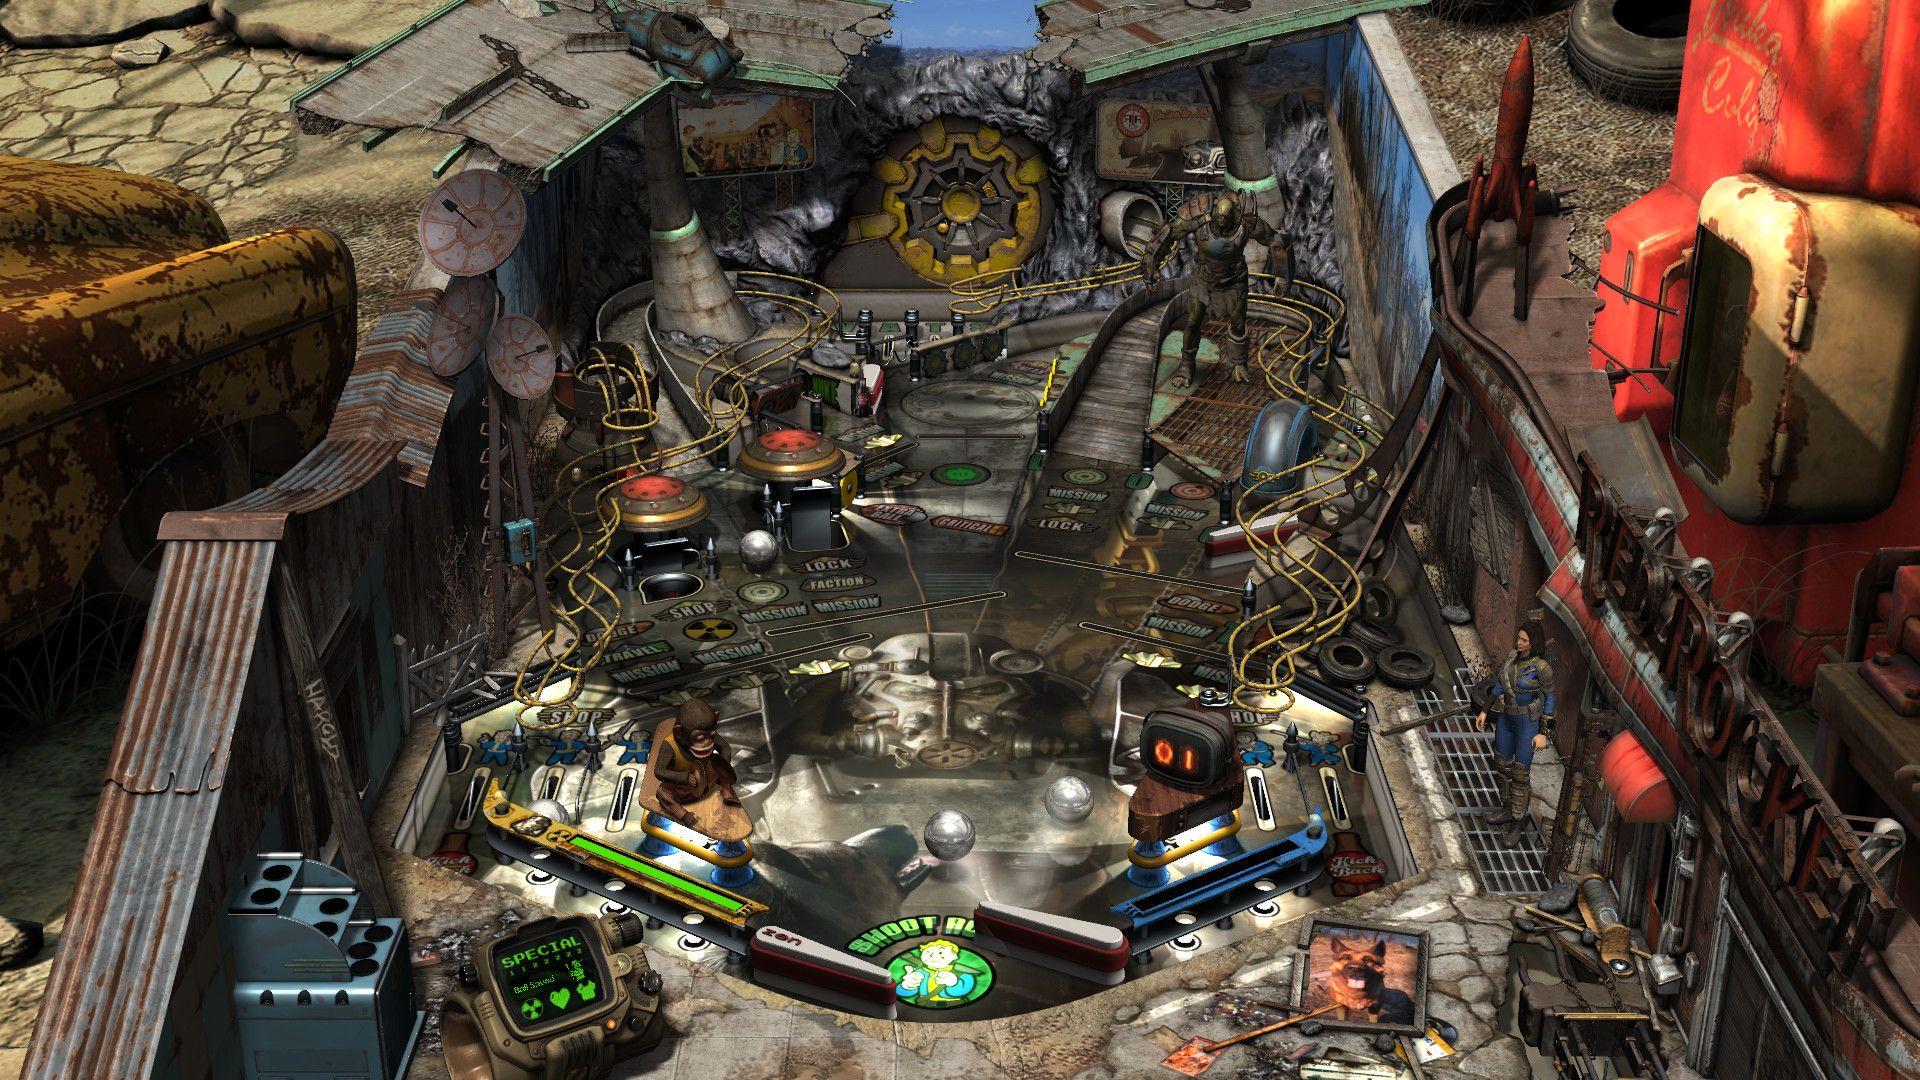 New Games DEAD RISING 4, LET IT DIE, THE LAST GUARDIAN